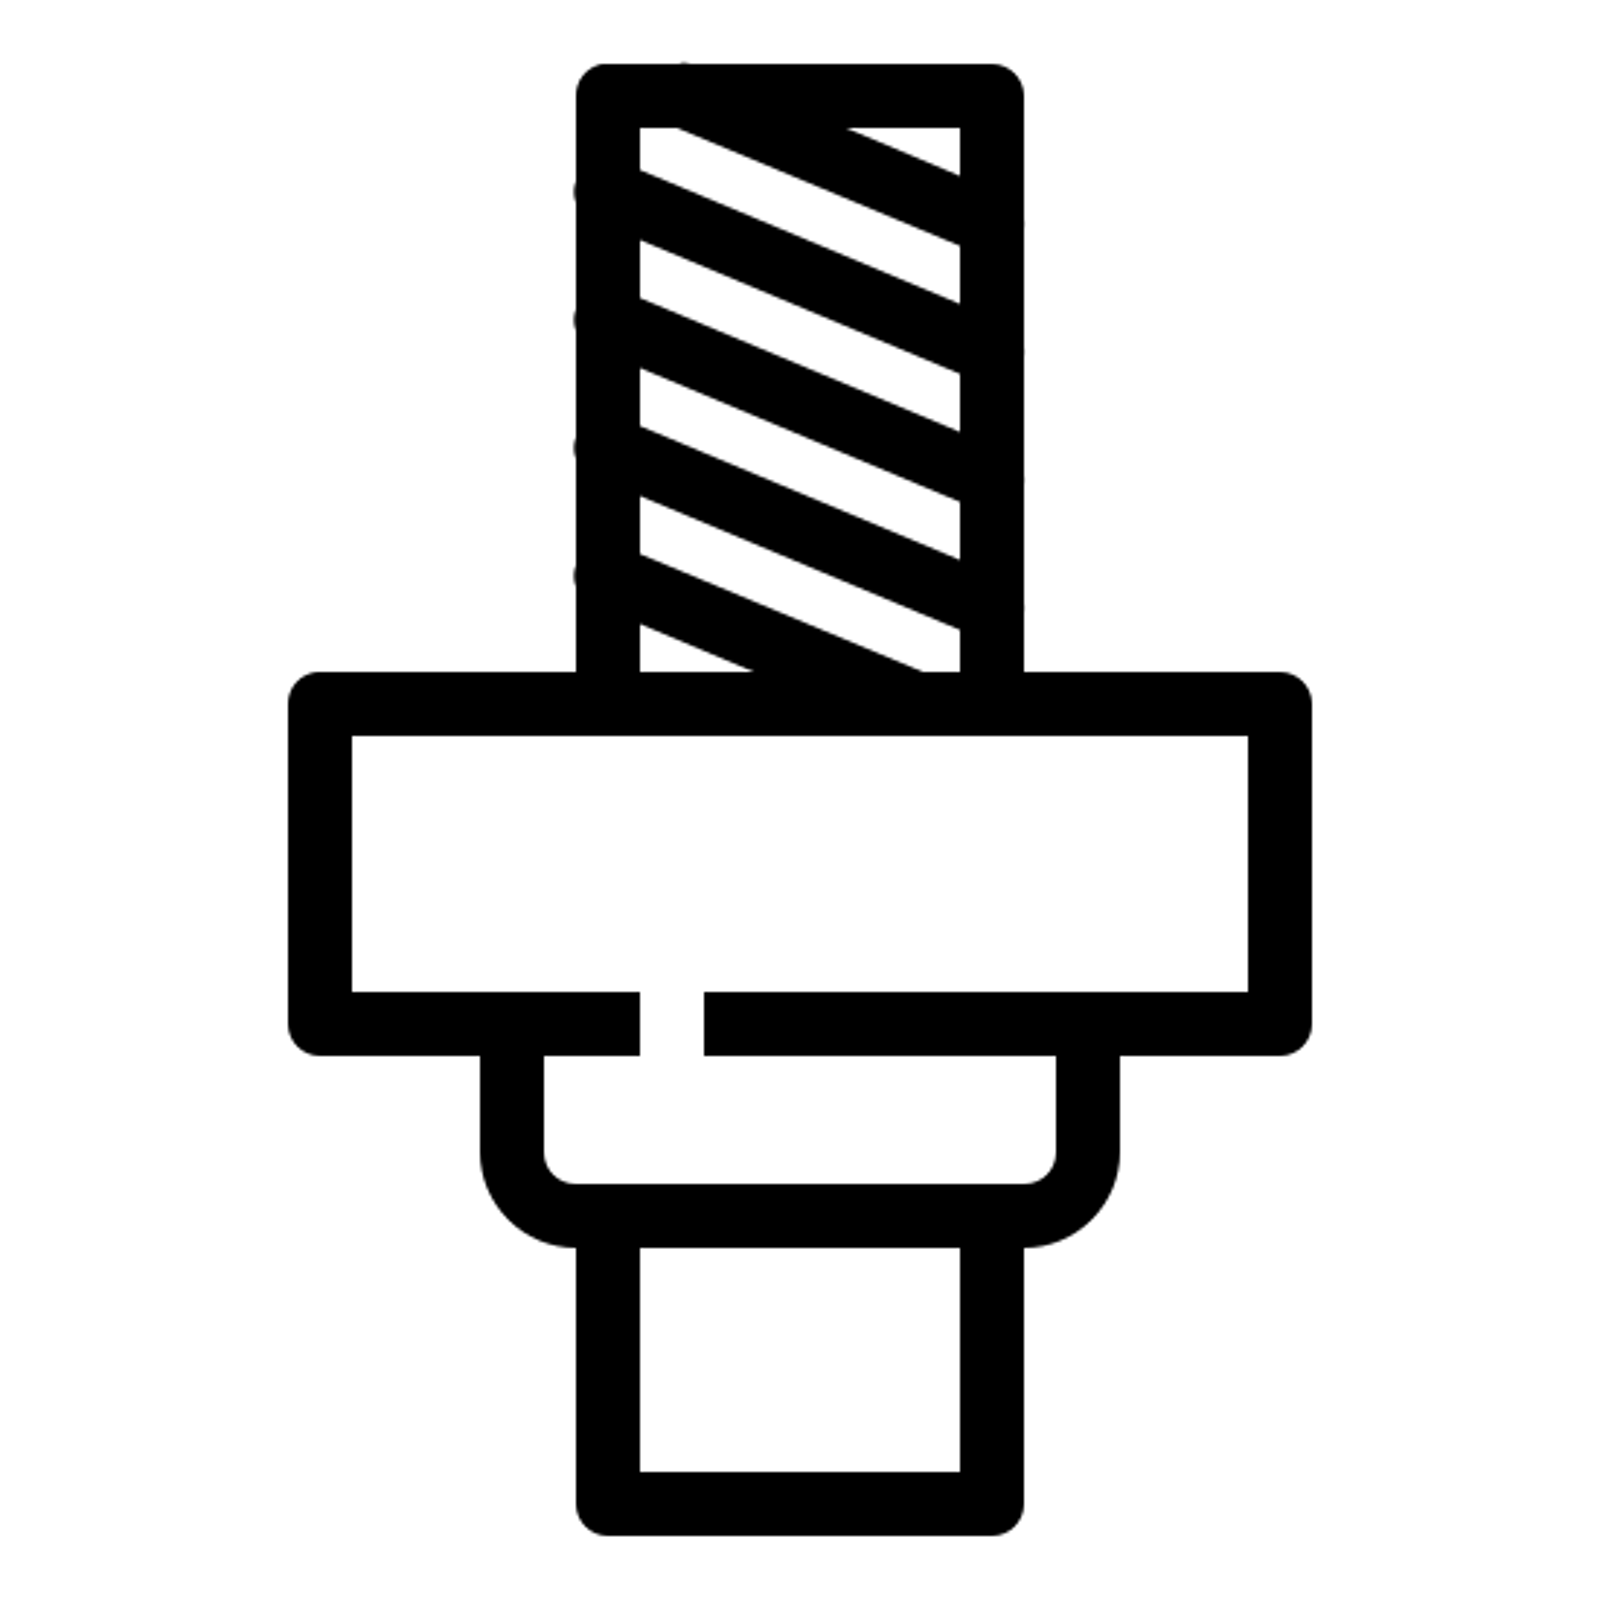 Gwintowany metal icon